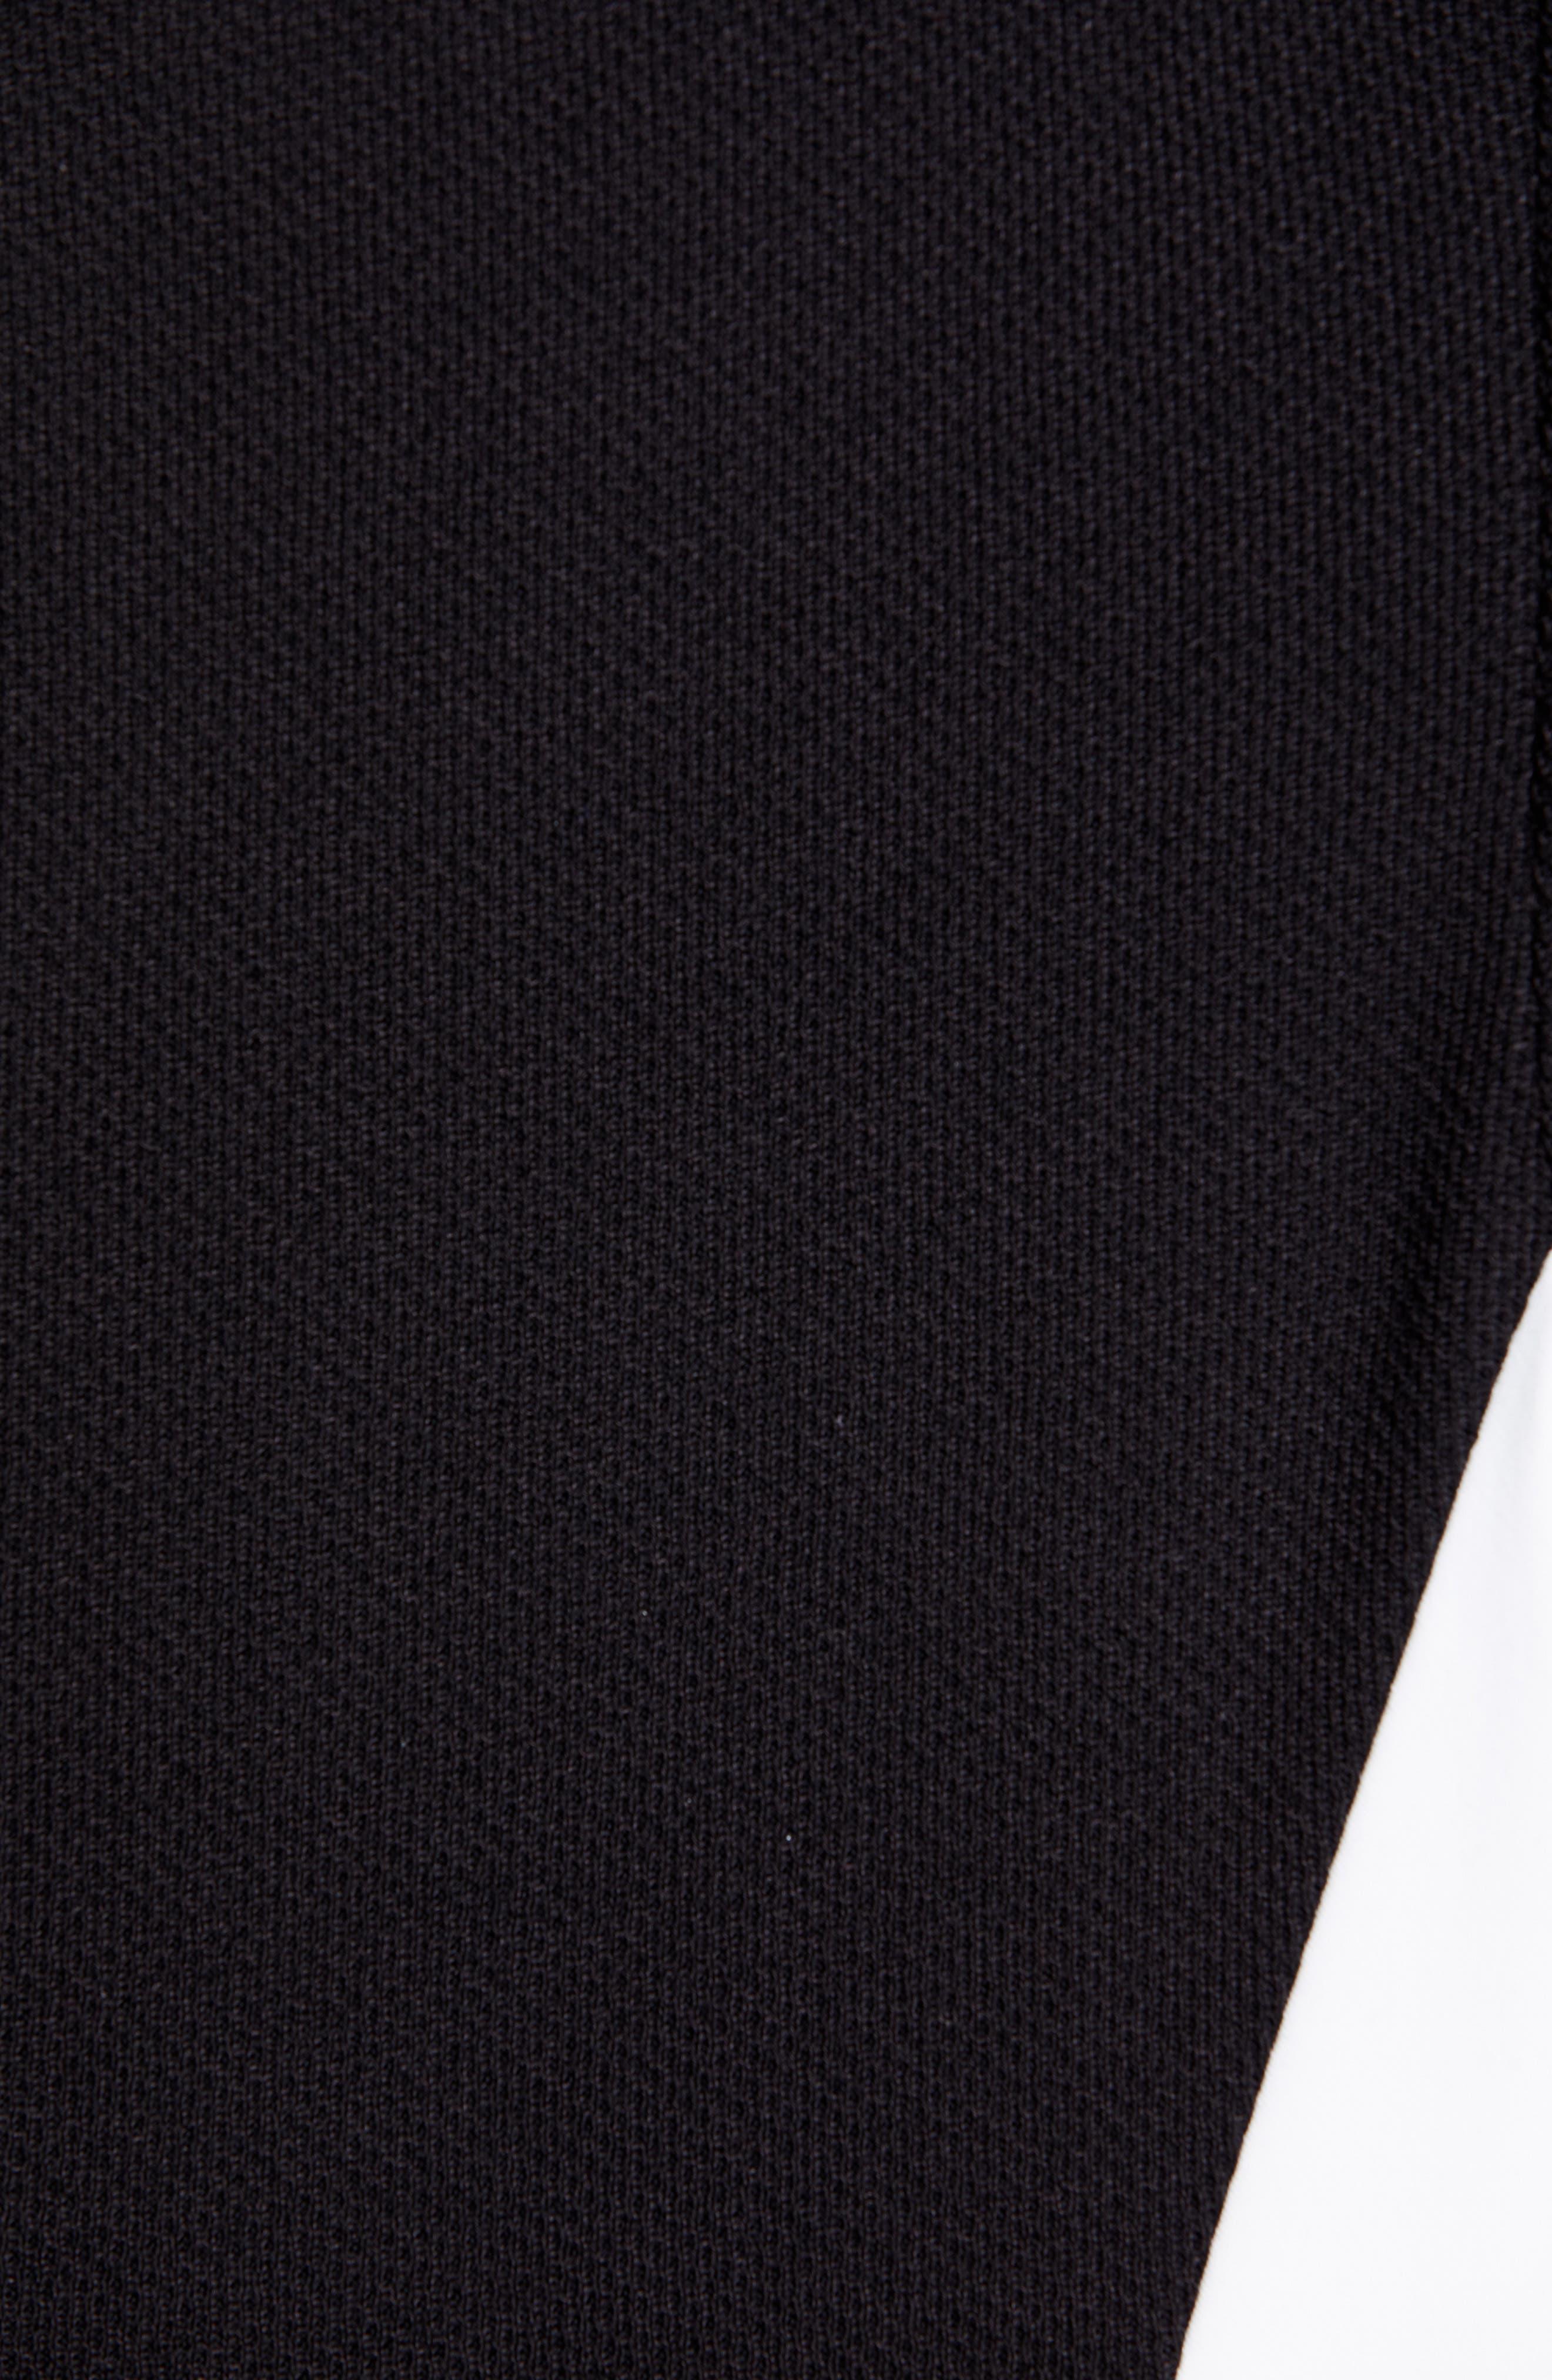 ST. JOHN COLLECTION, Piqué Milano Knit Dress, Alternate thumbnail 6, color, CAVIAR/ BIANCO